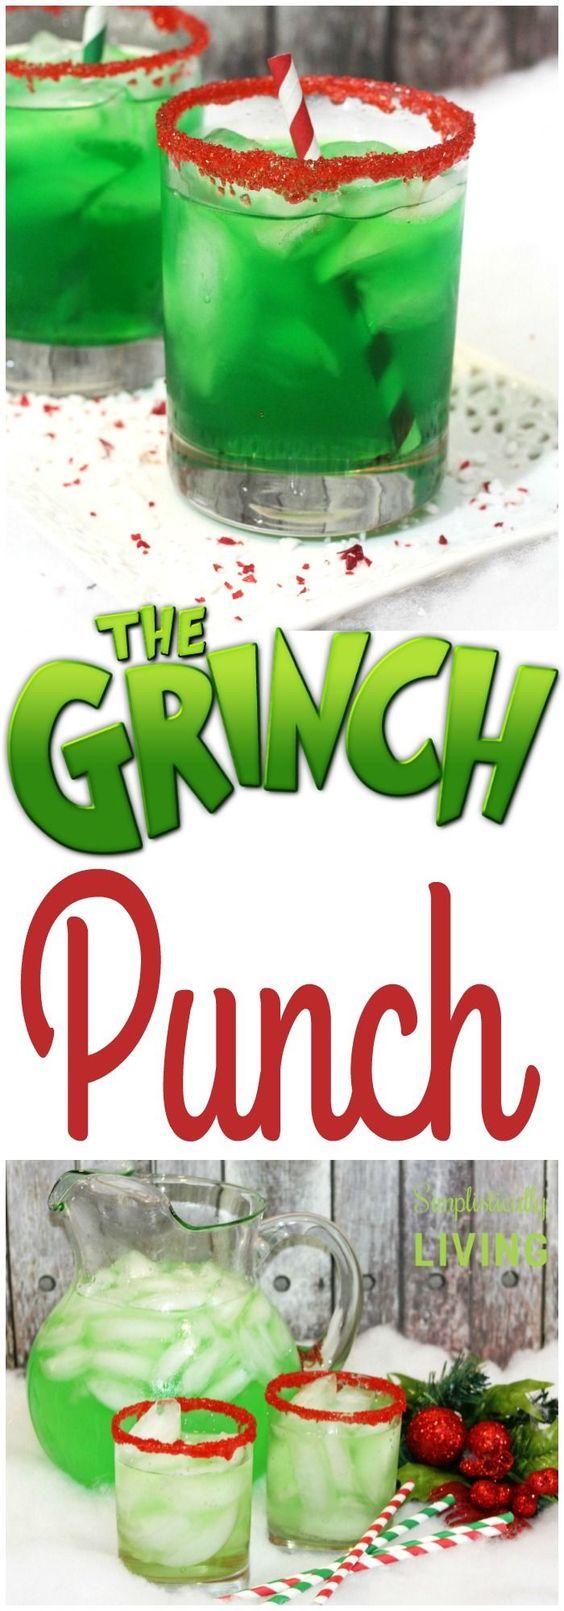 Grinch Punch recipe